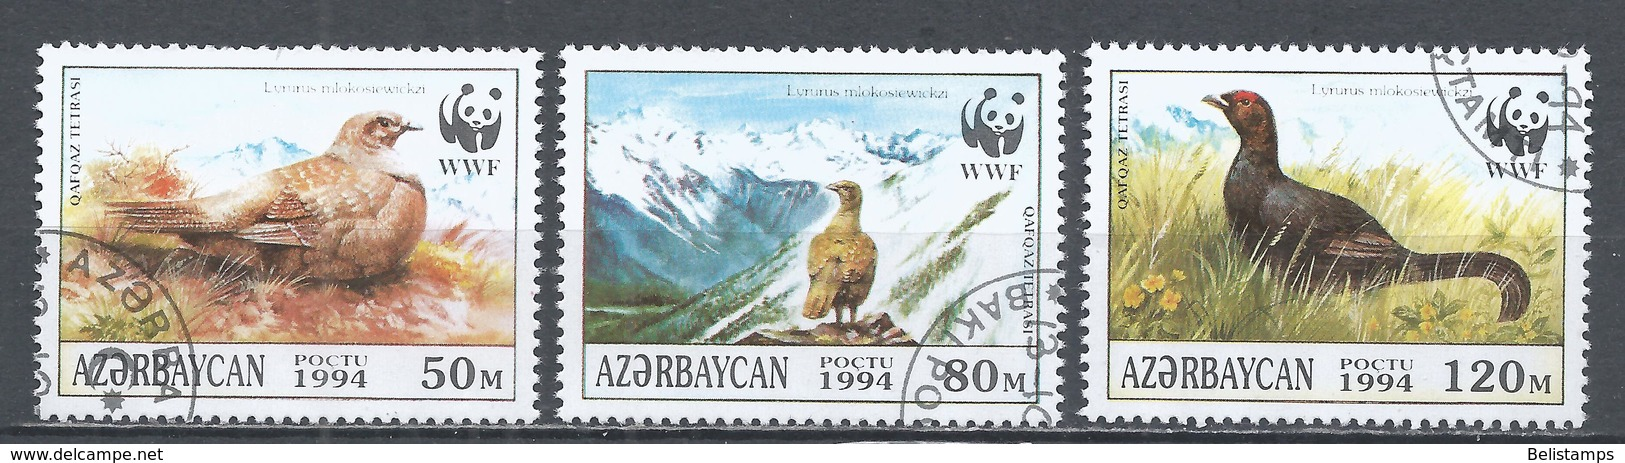 Azerbaijan 1994. Lot #1 (U) W.W.F. Birds * - Azerbaïjan